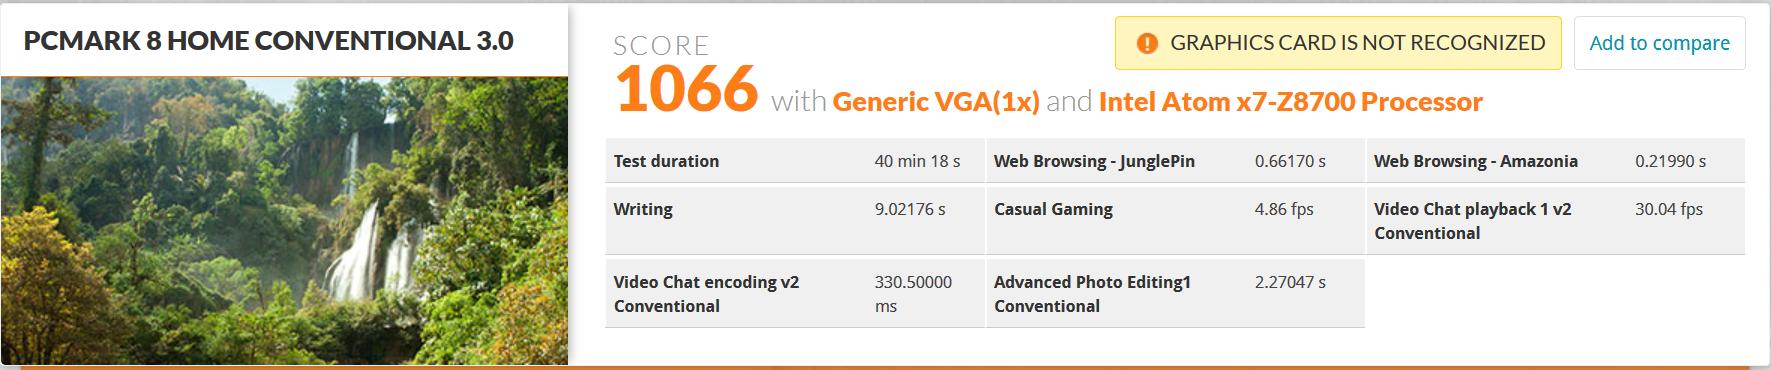 Voyo_V3_PCMARK8_Conventional_3.0_Crash